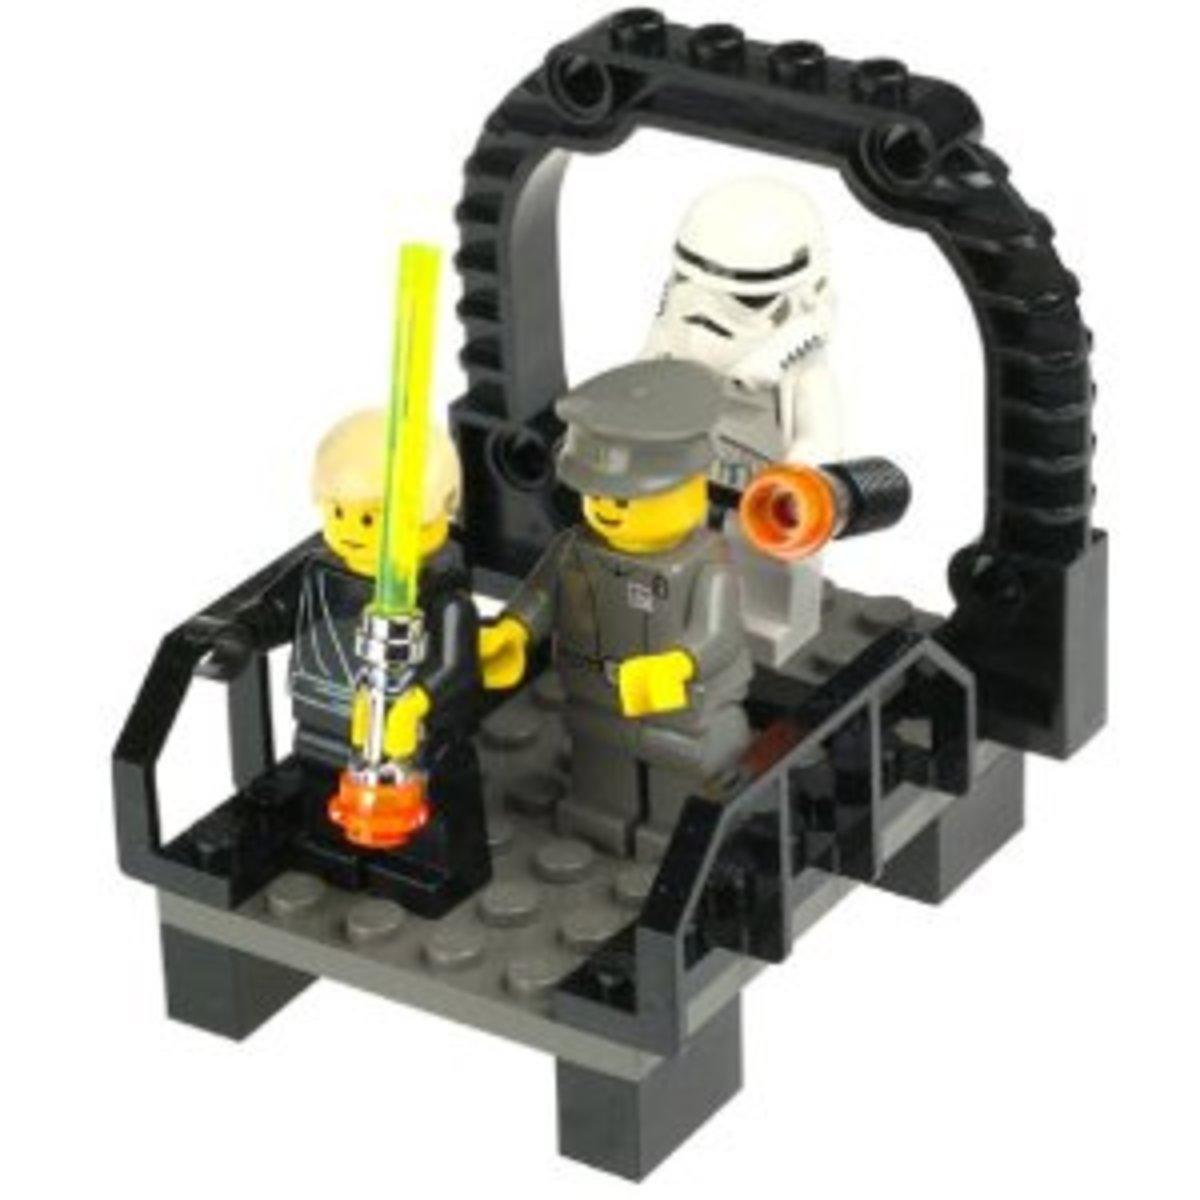 LEGO Star Wars Final Duel 2 7201 Assembled